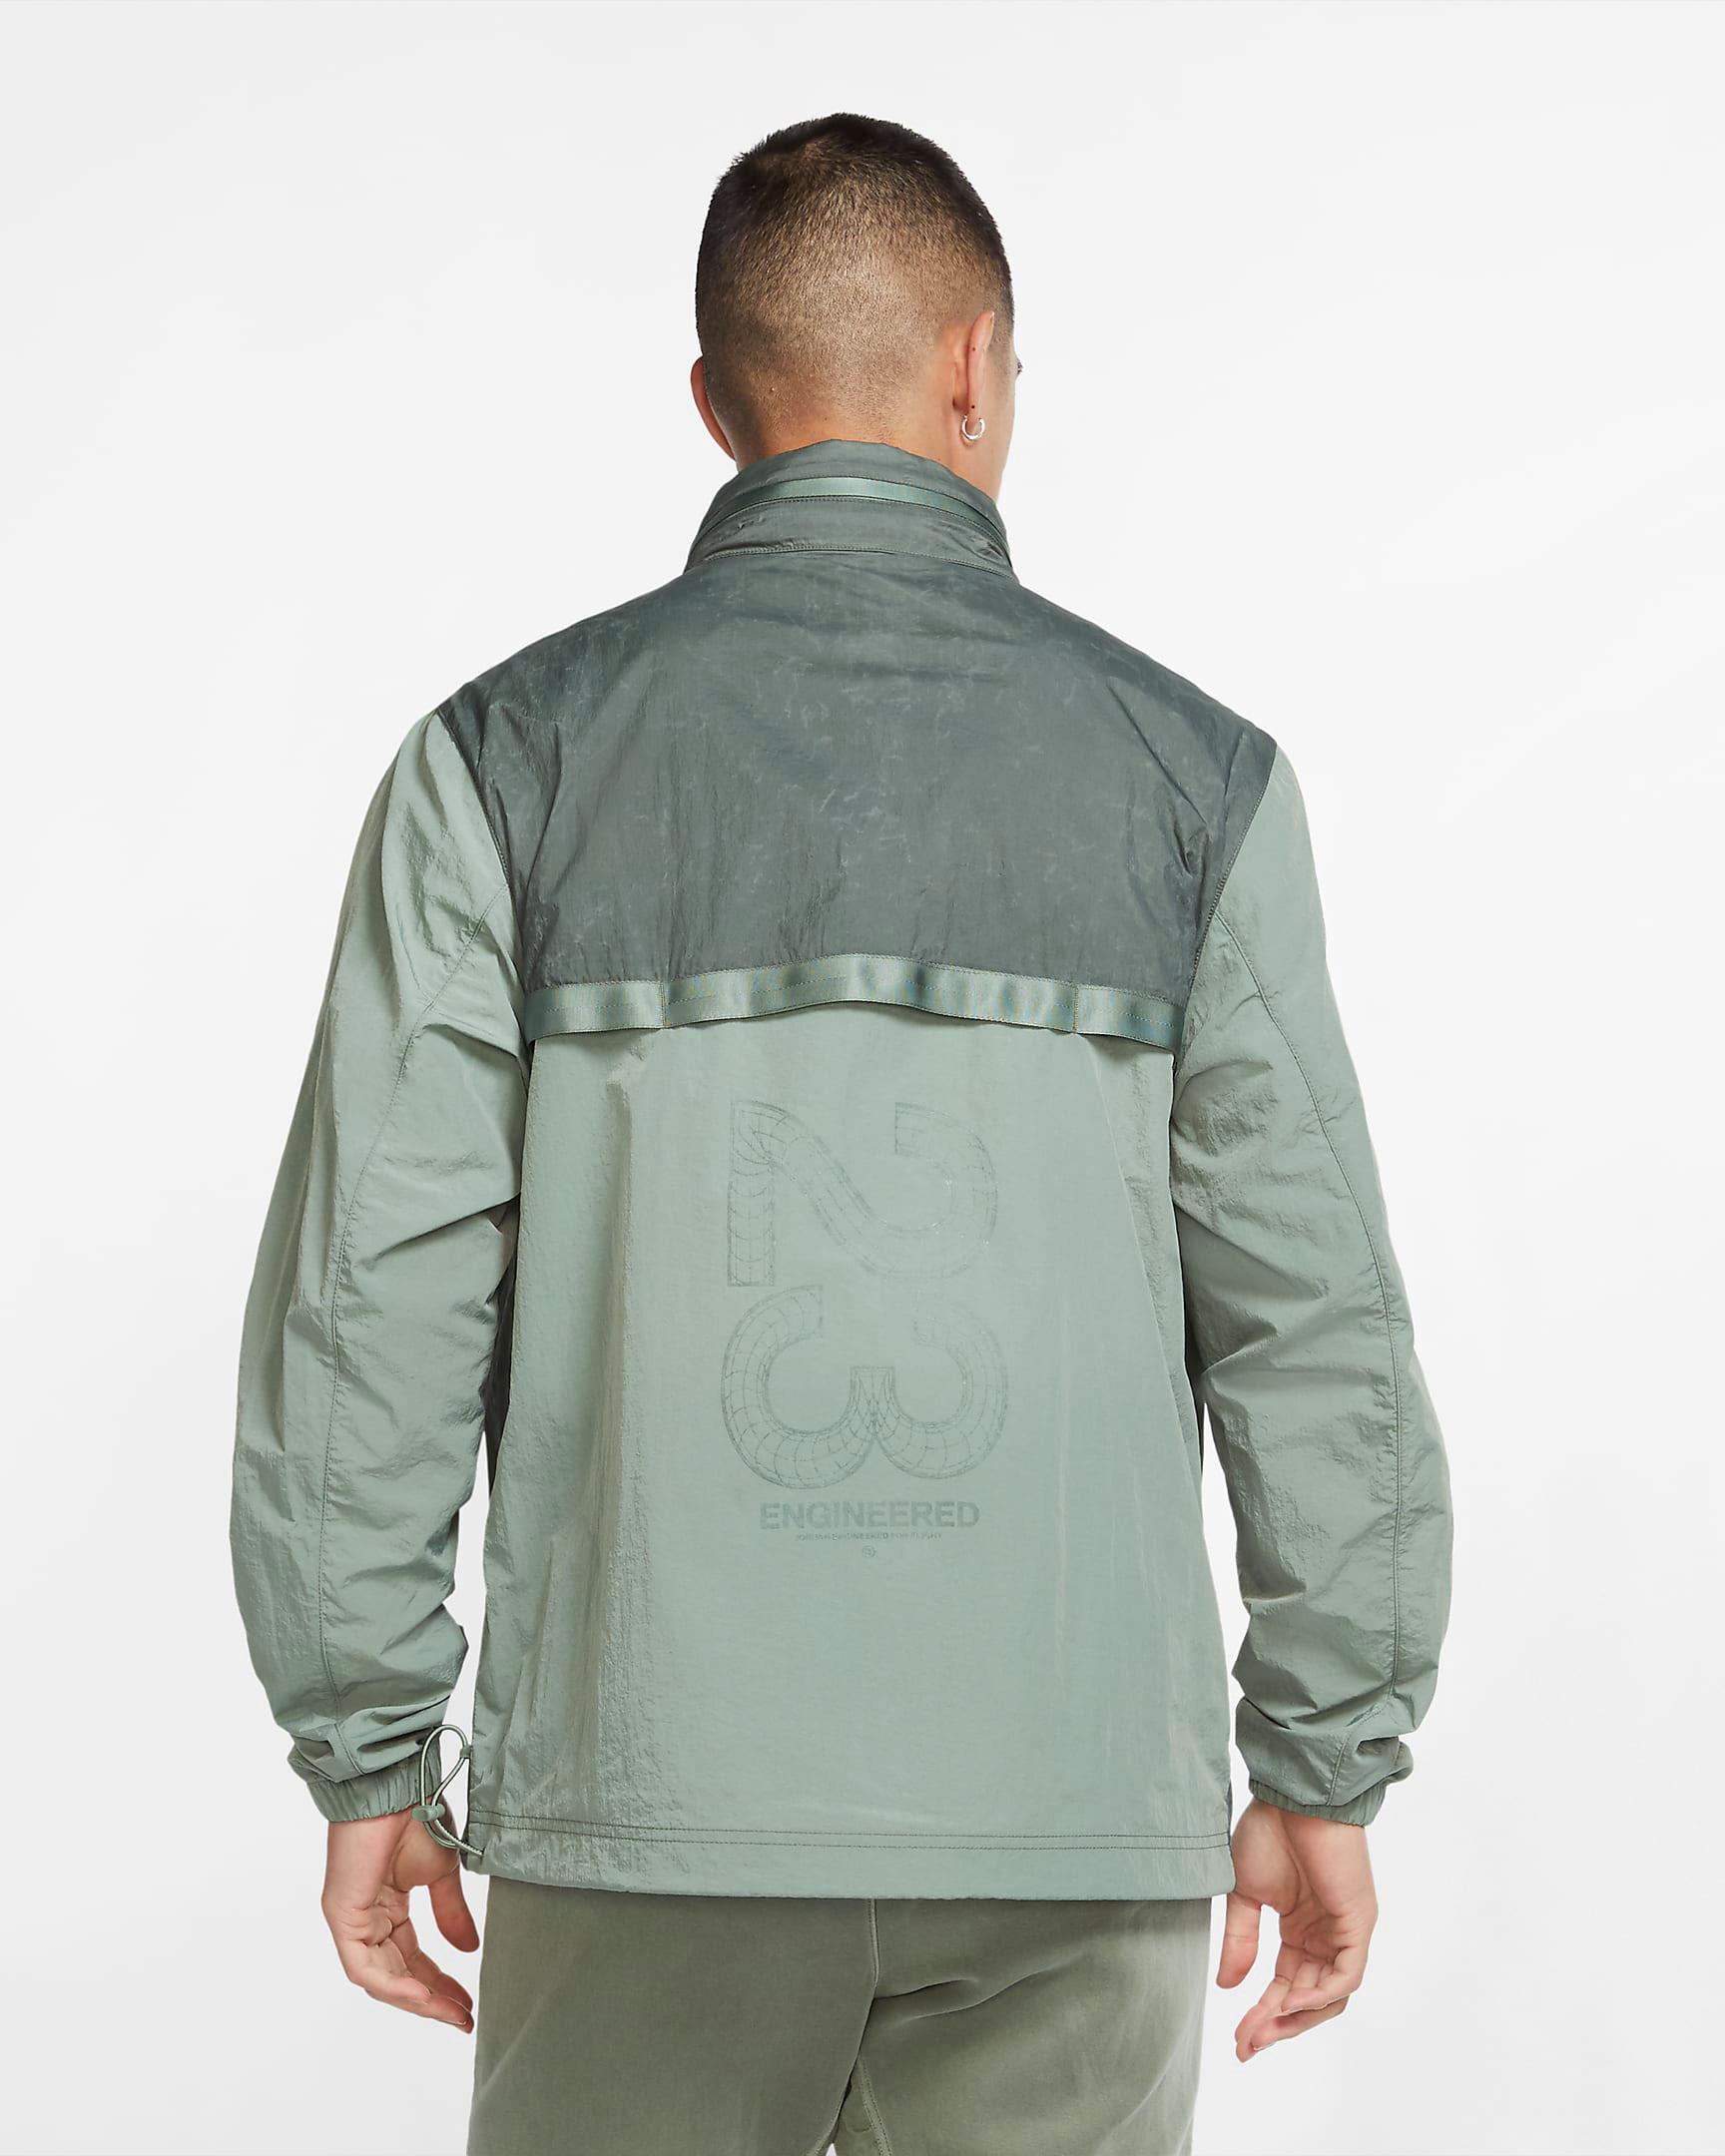 jordan-23-engineered-jacket-olive-green-2